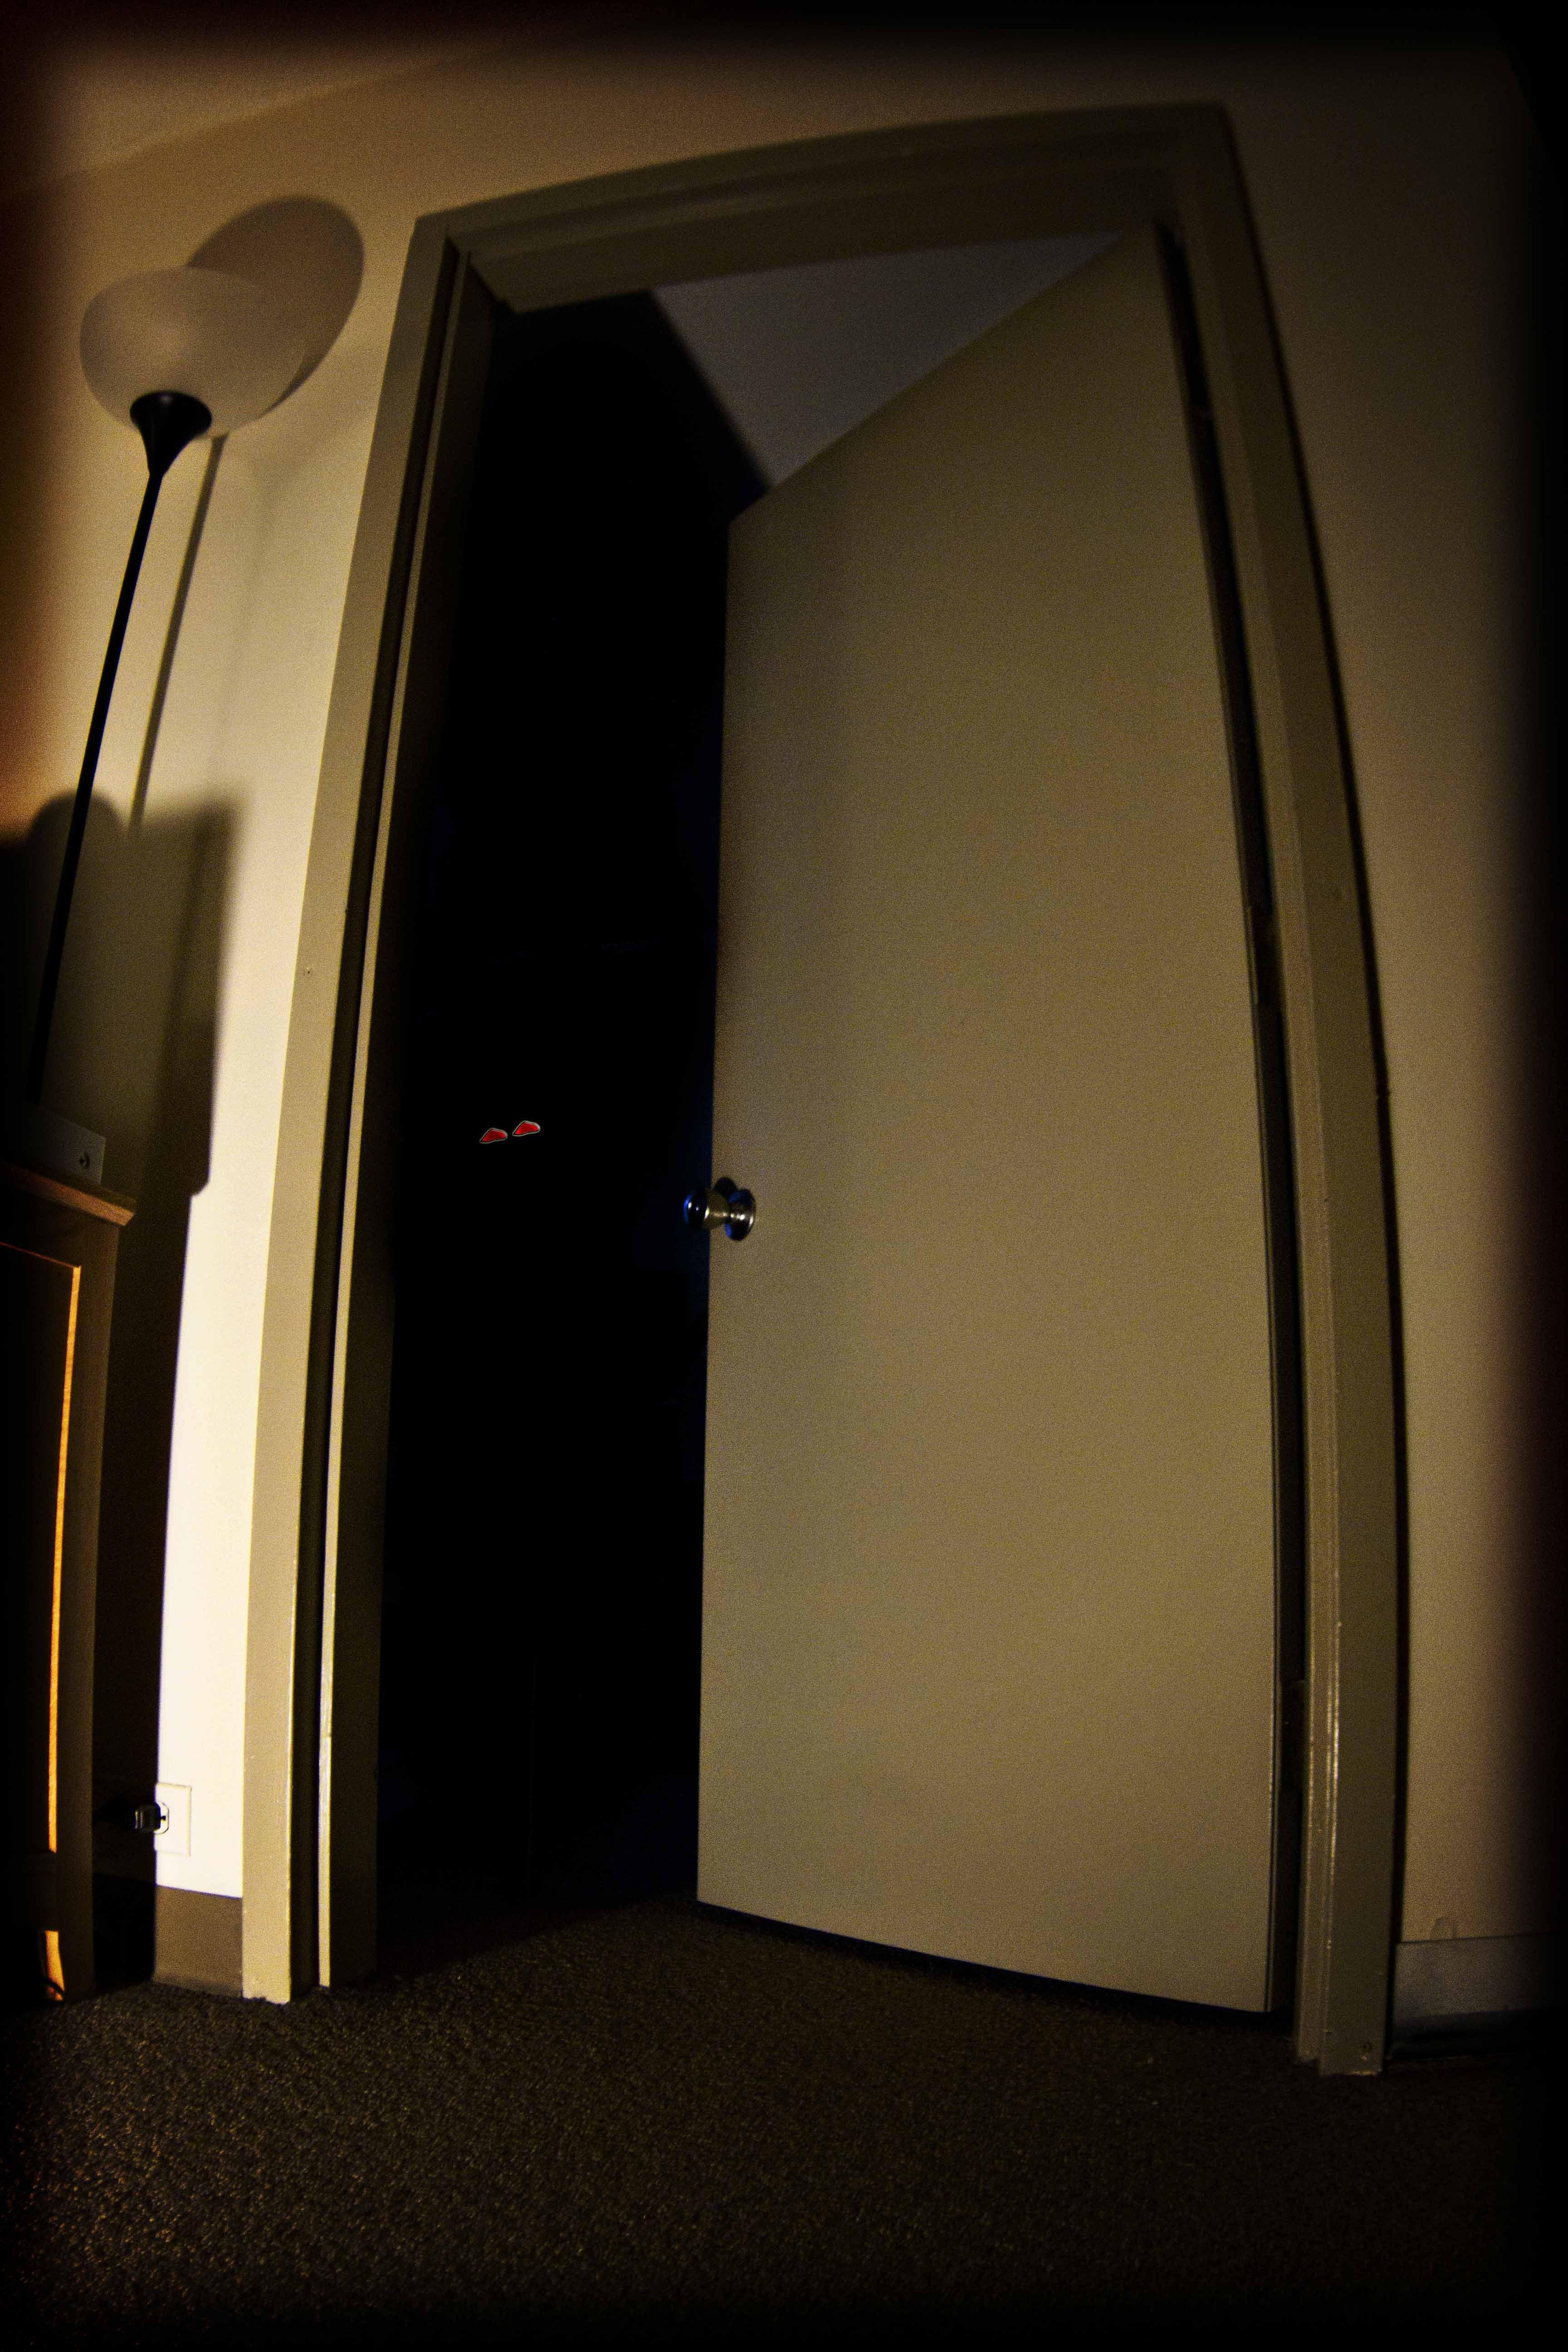 Dark Closet Doorclown The Reely Bored Blog Horror